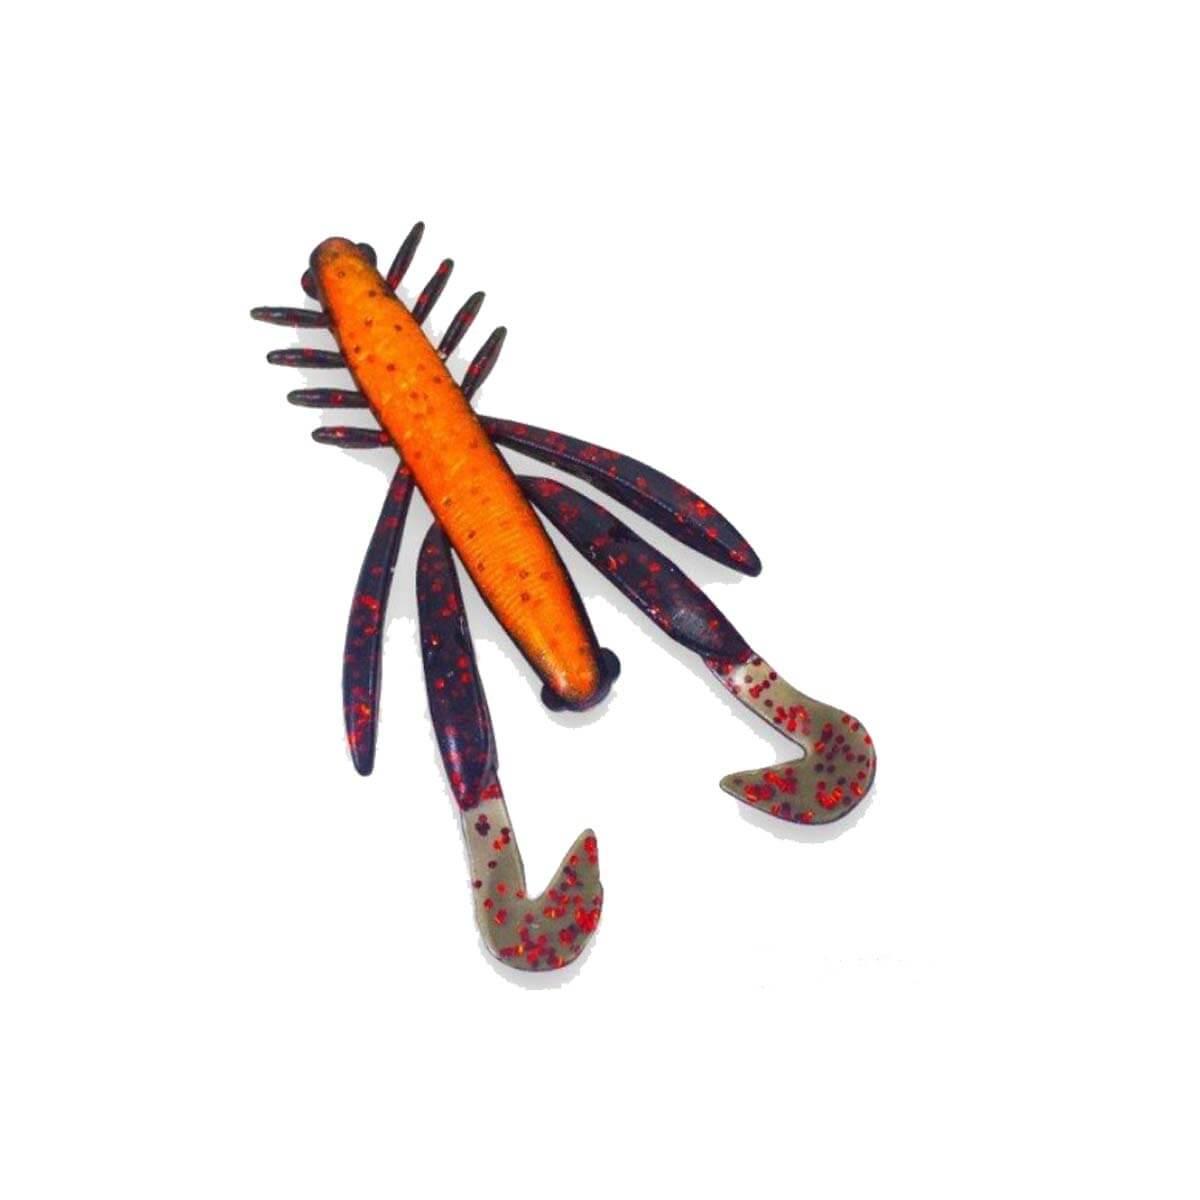 Isca Artificial Camalesma Divoc Craw 11 cm  - Pró Pesca Shop